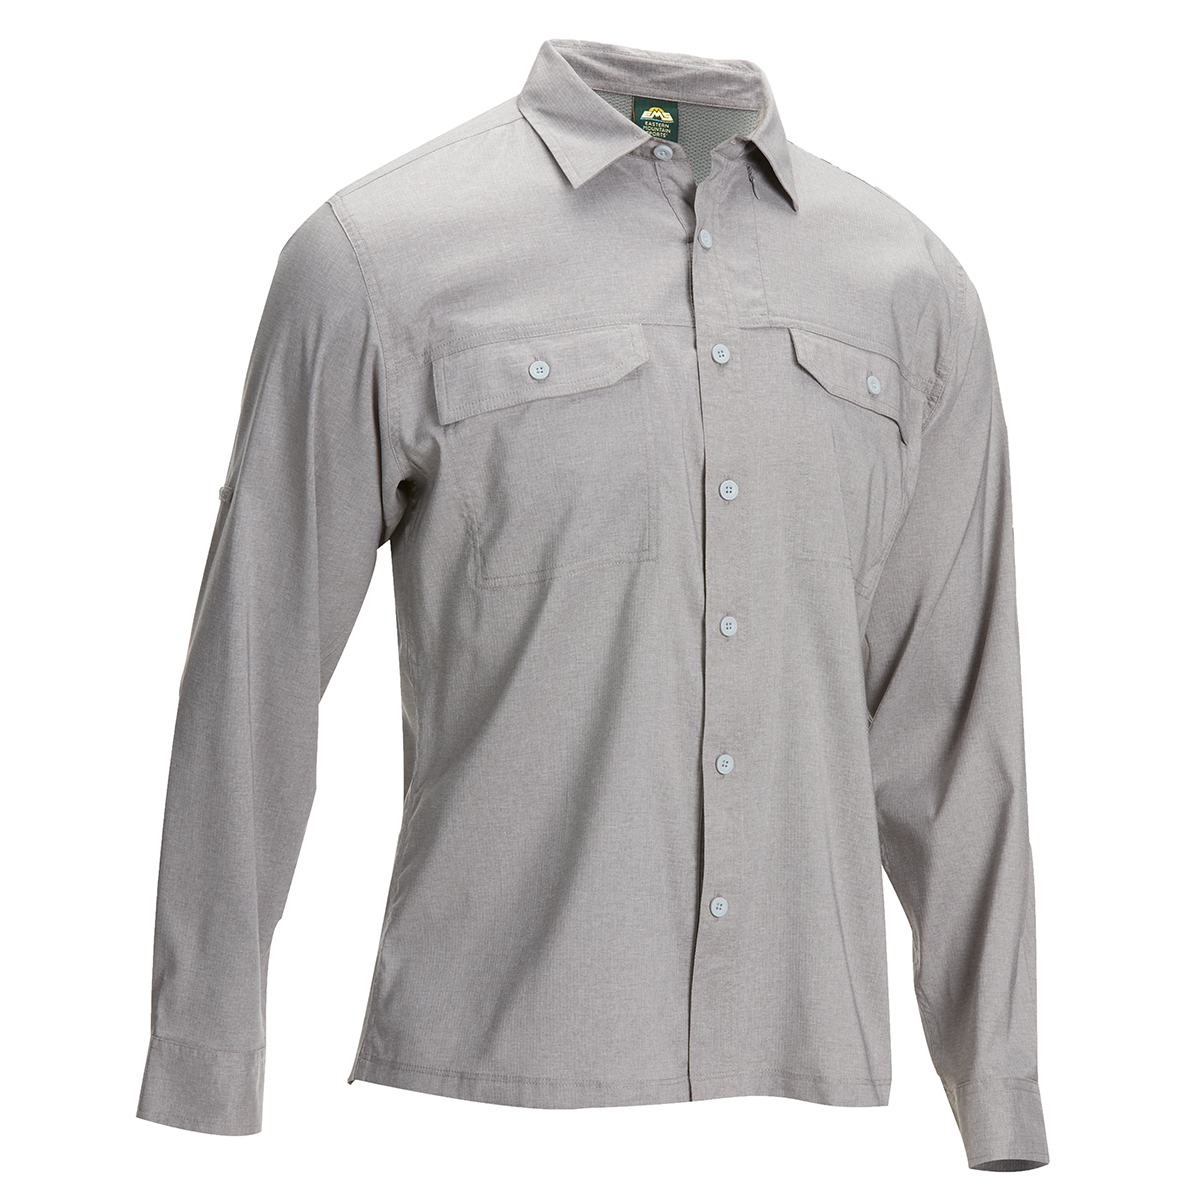 Ems Men's Ventilator Long-Sleeve Shirt - Black, M